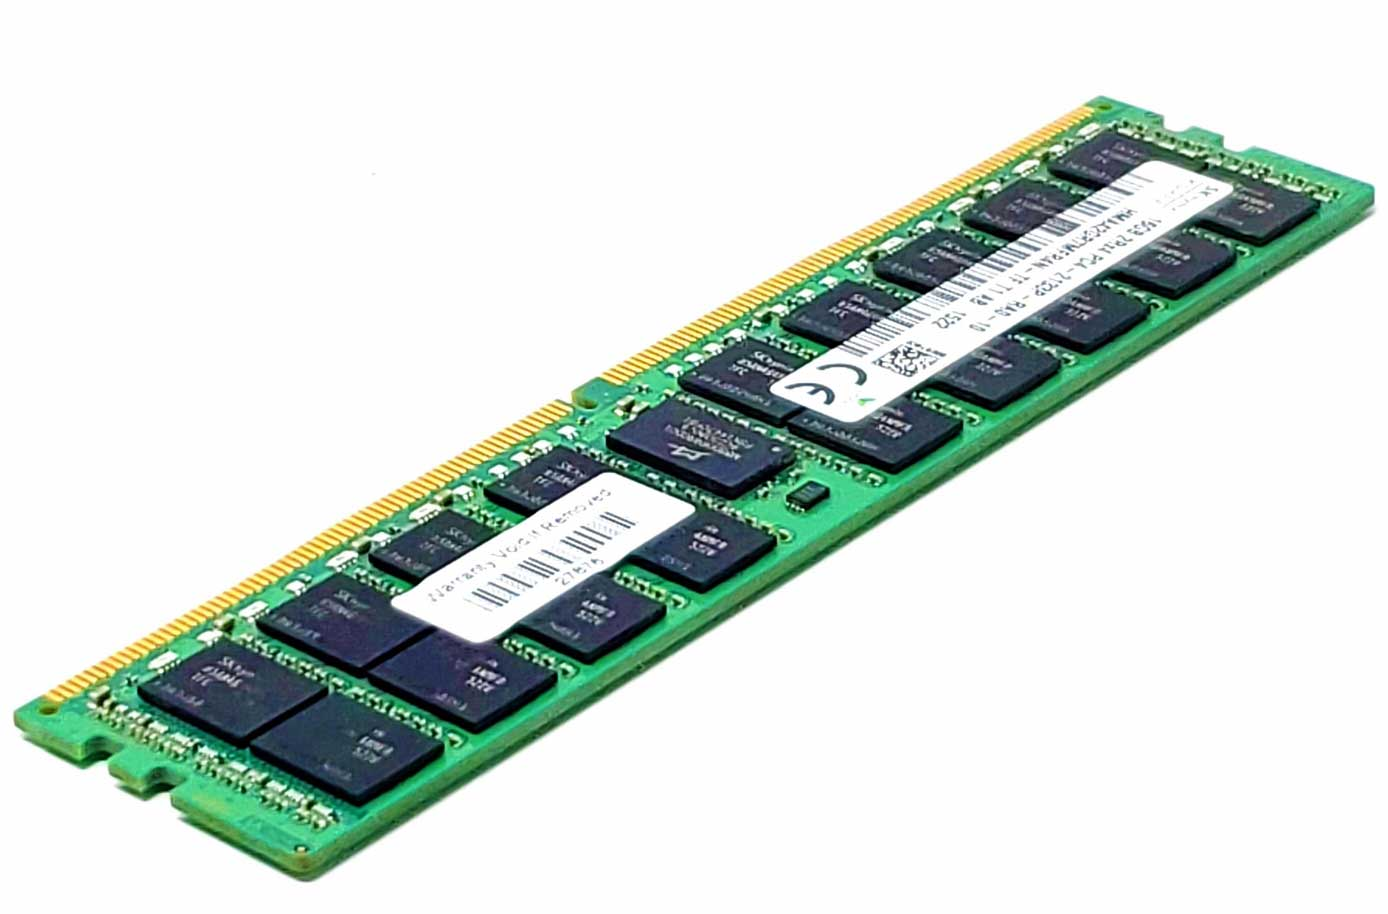 1X16GB 864707-591 HPE 16GB 1RX4 PC4-2666V-R MEMORY MODULE